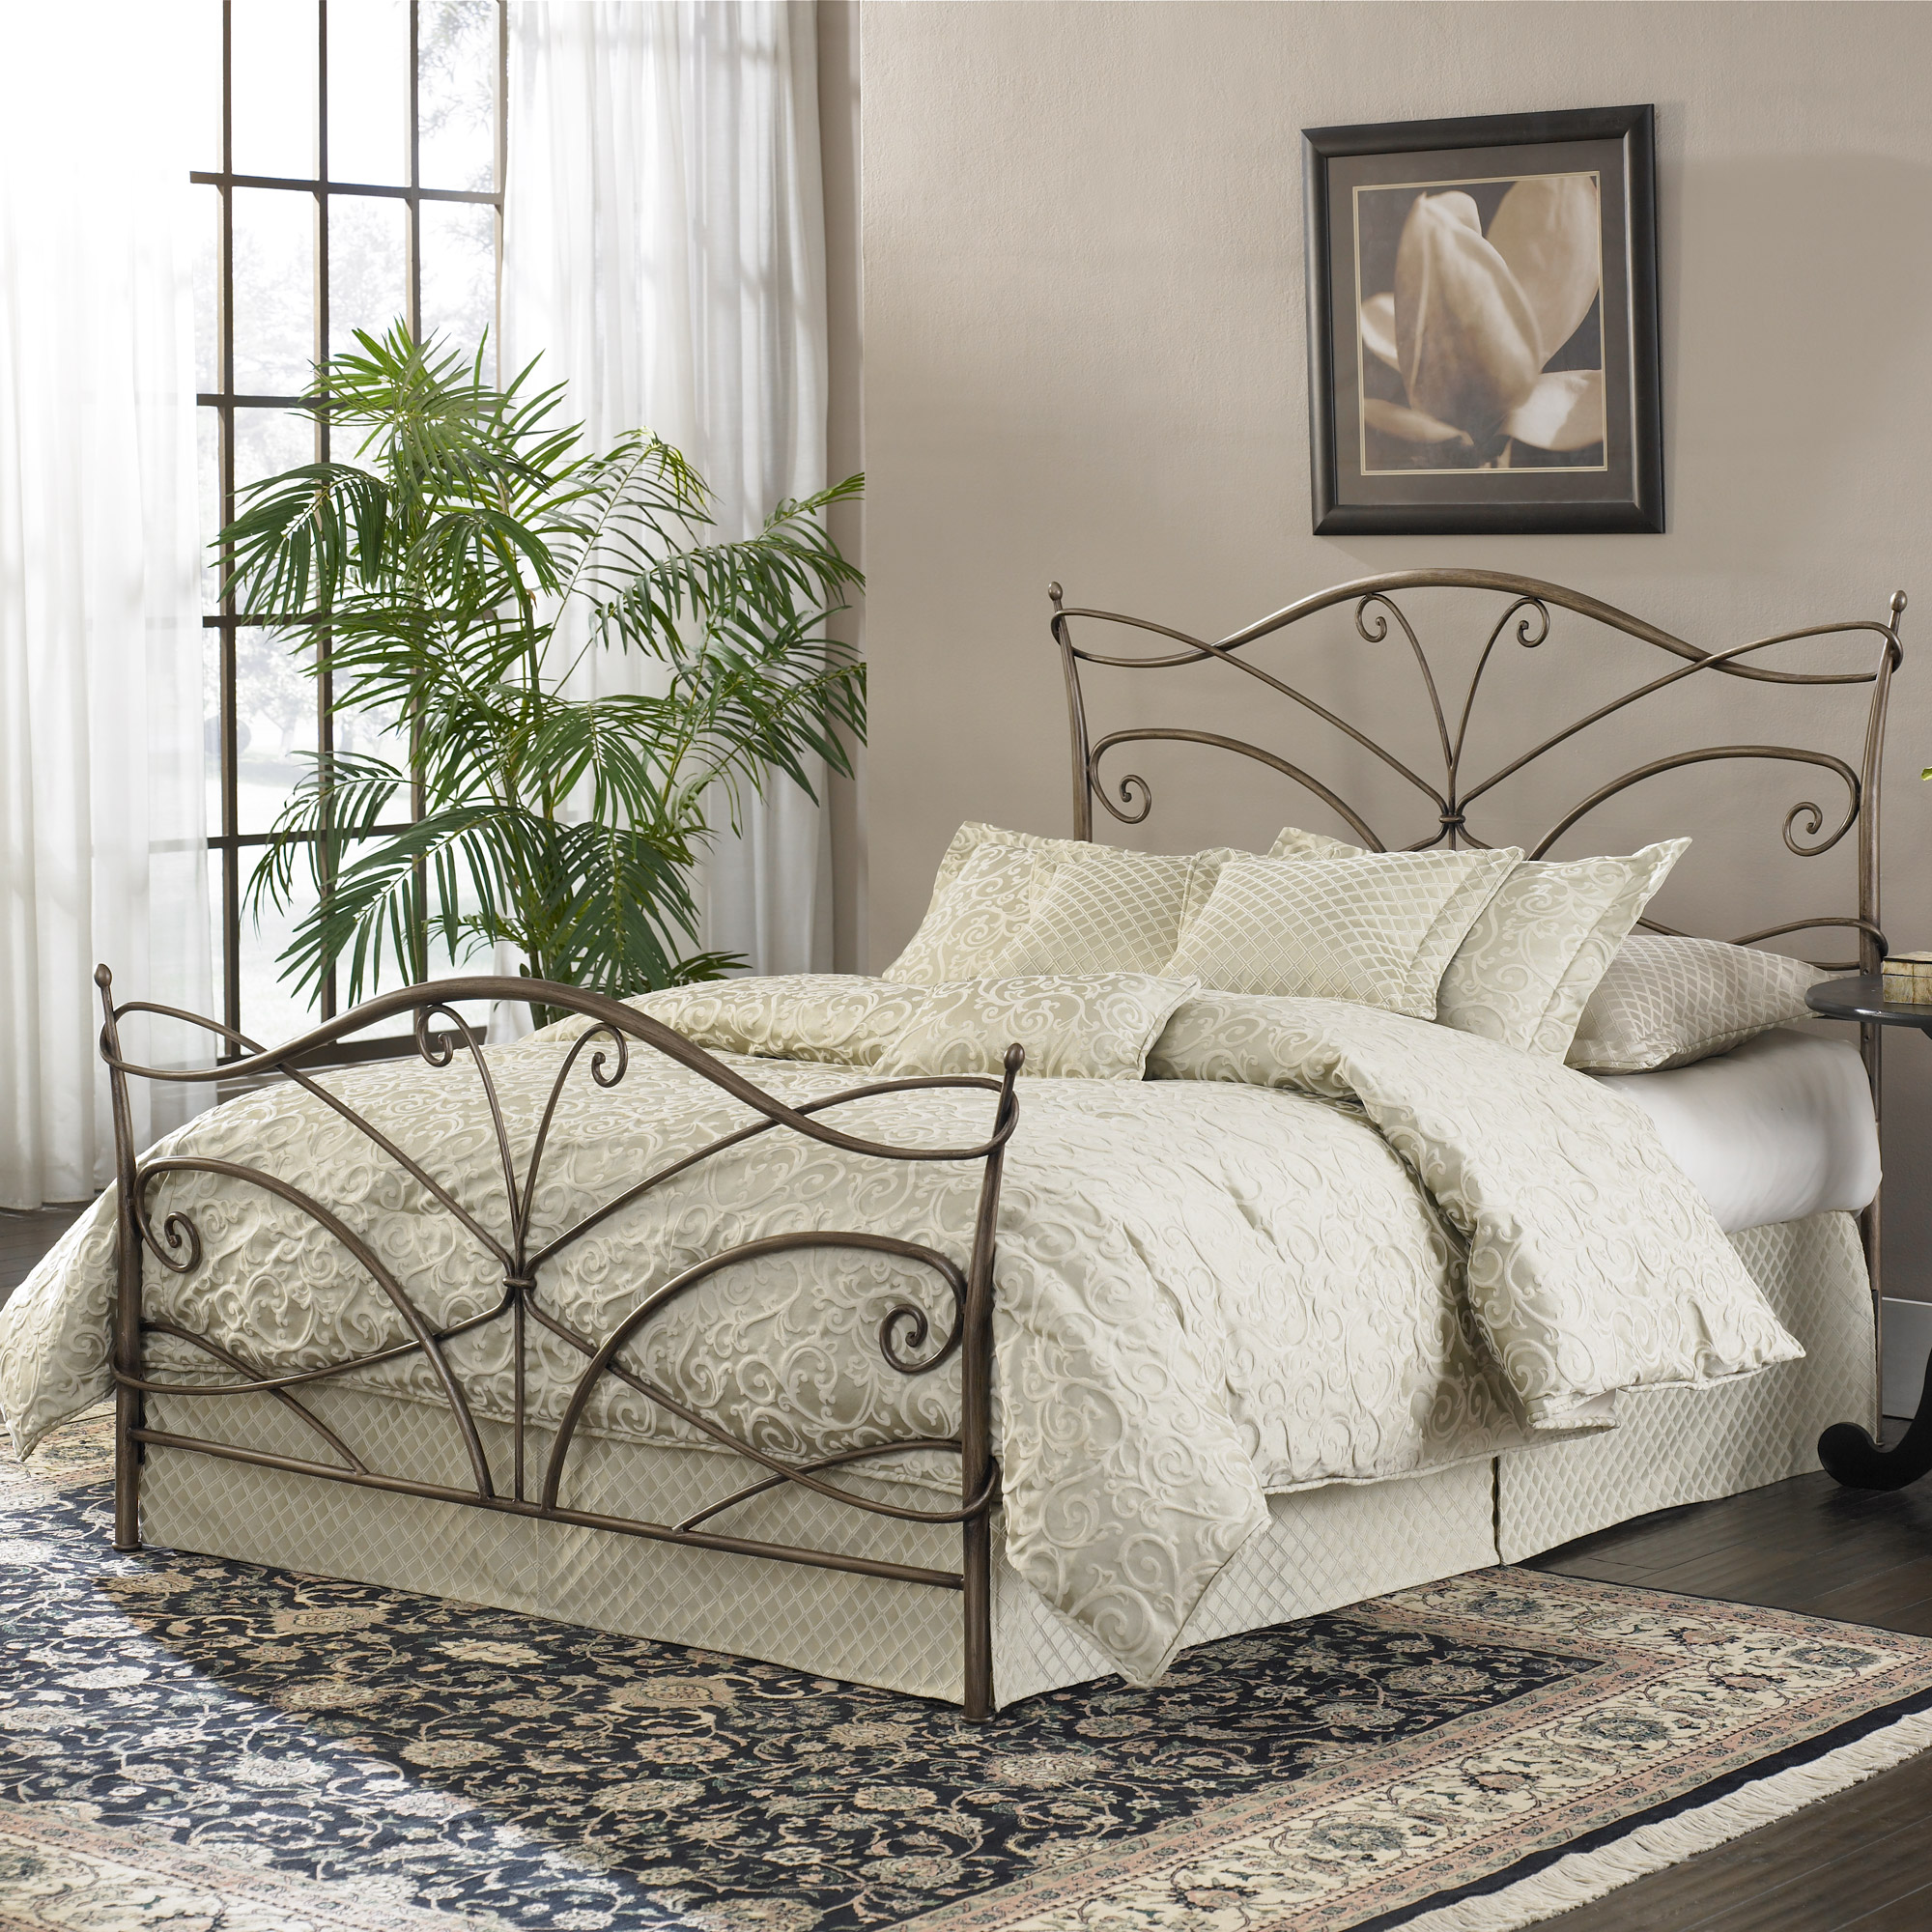 home beds headboards iron beds headboards bergen headboard. Black Bedroom Furniture Sets. Home Design Ideas